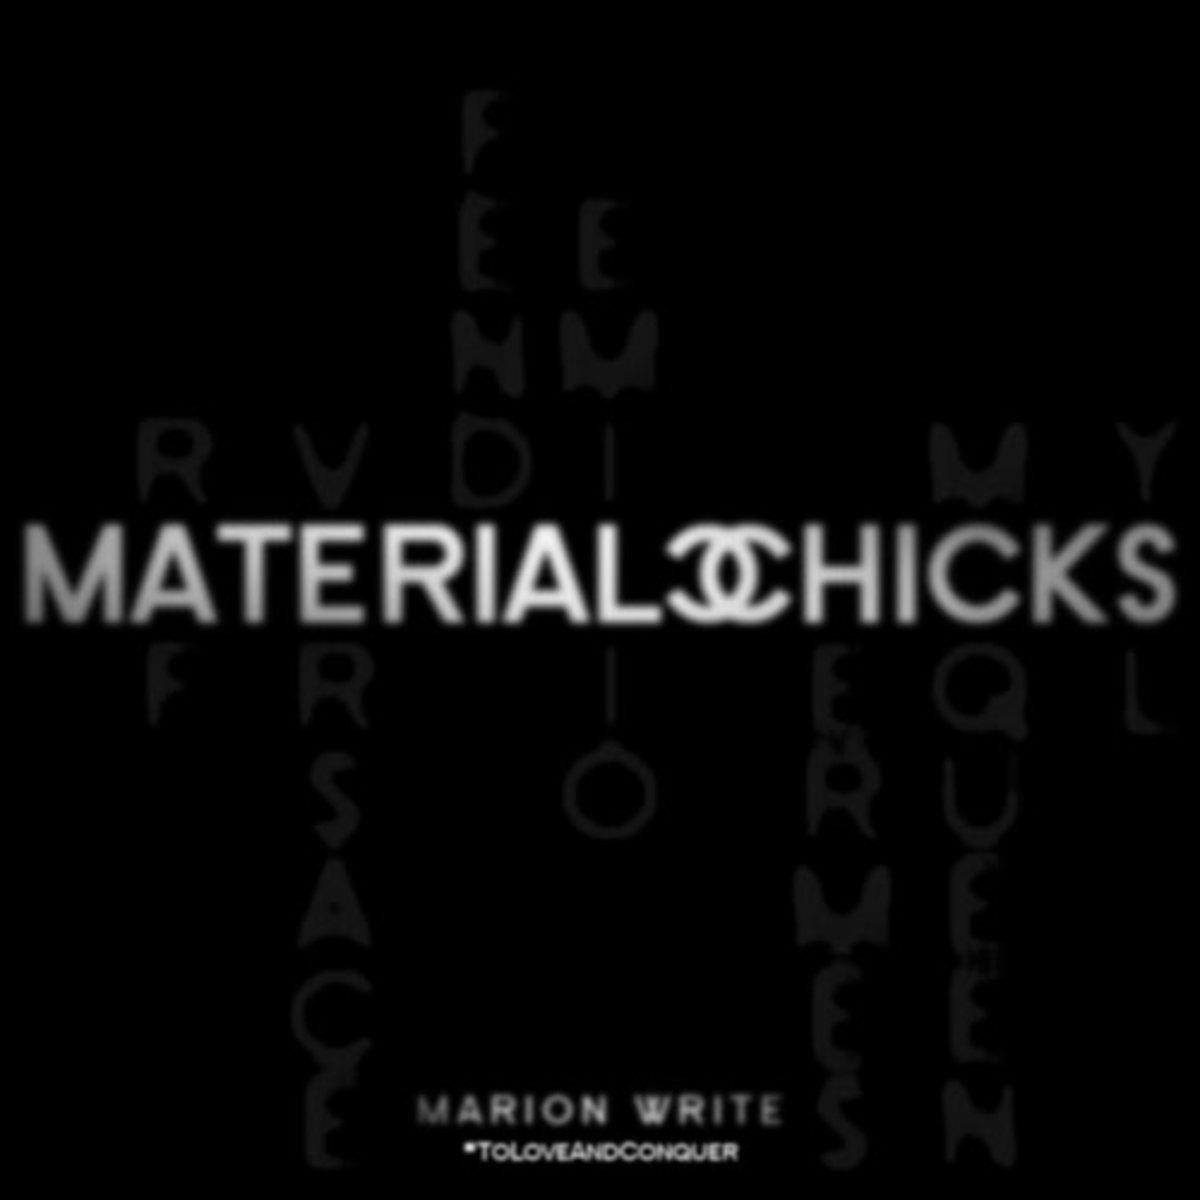 marionwrite-material.jpg